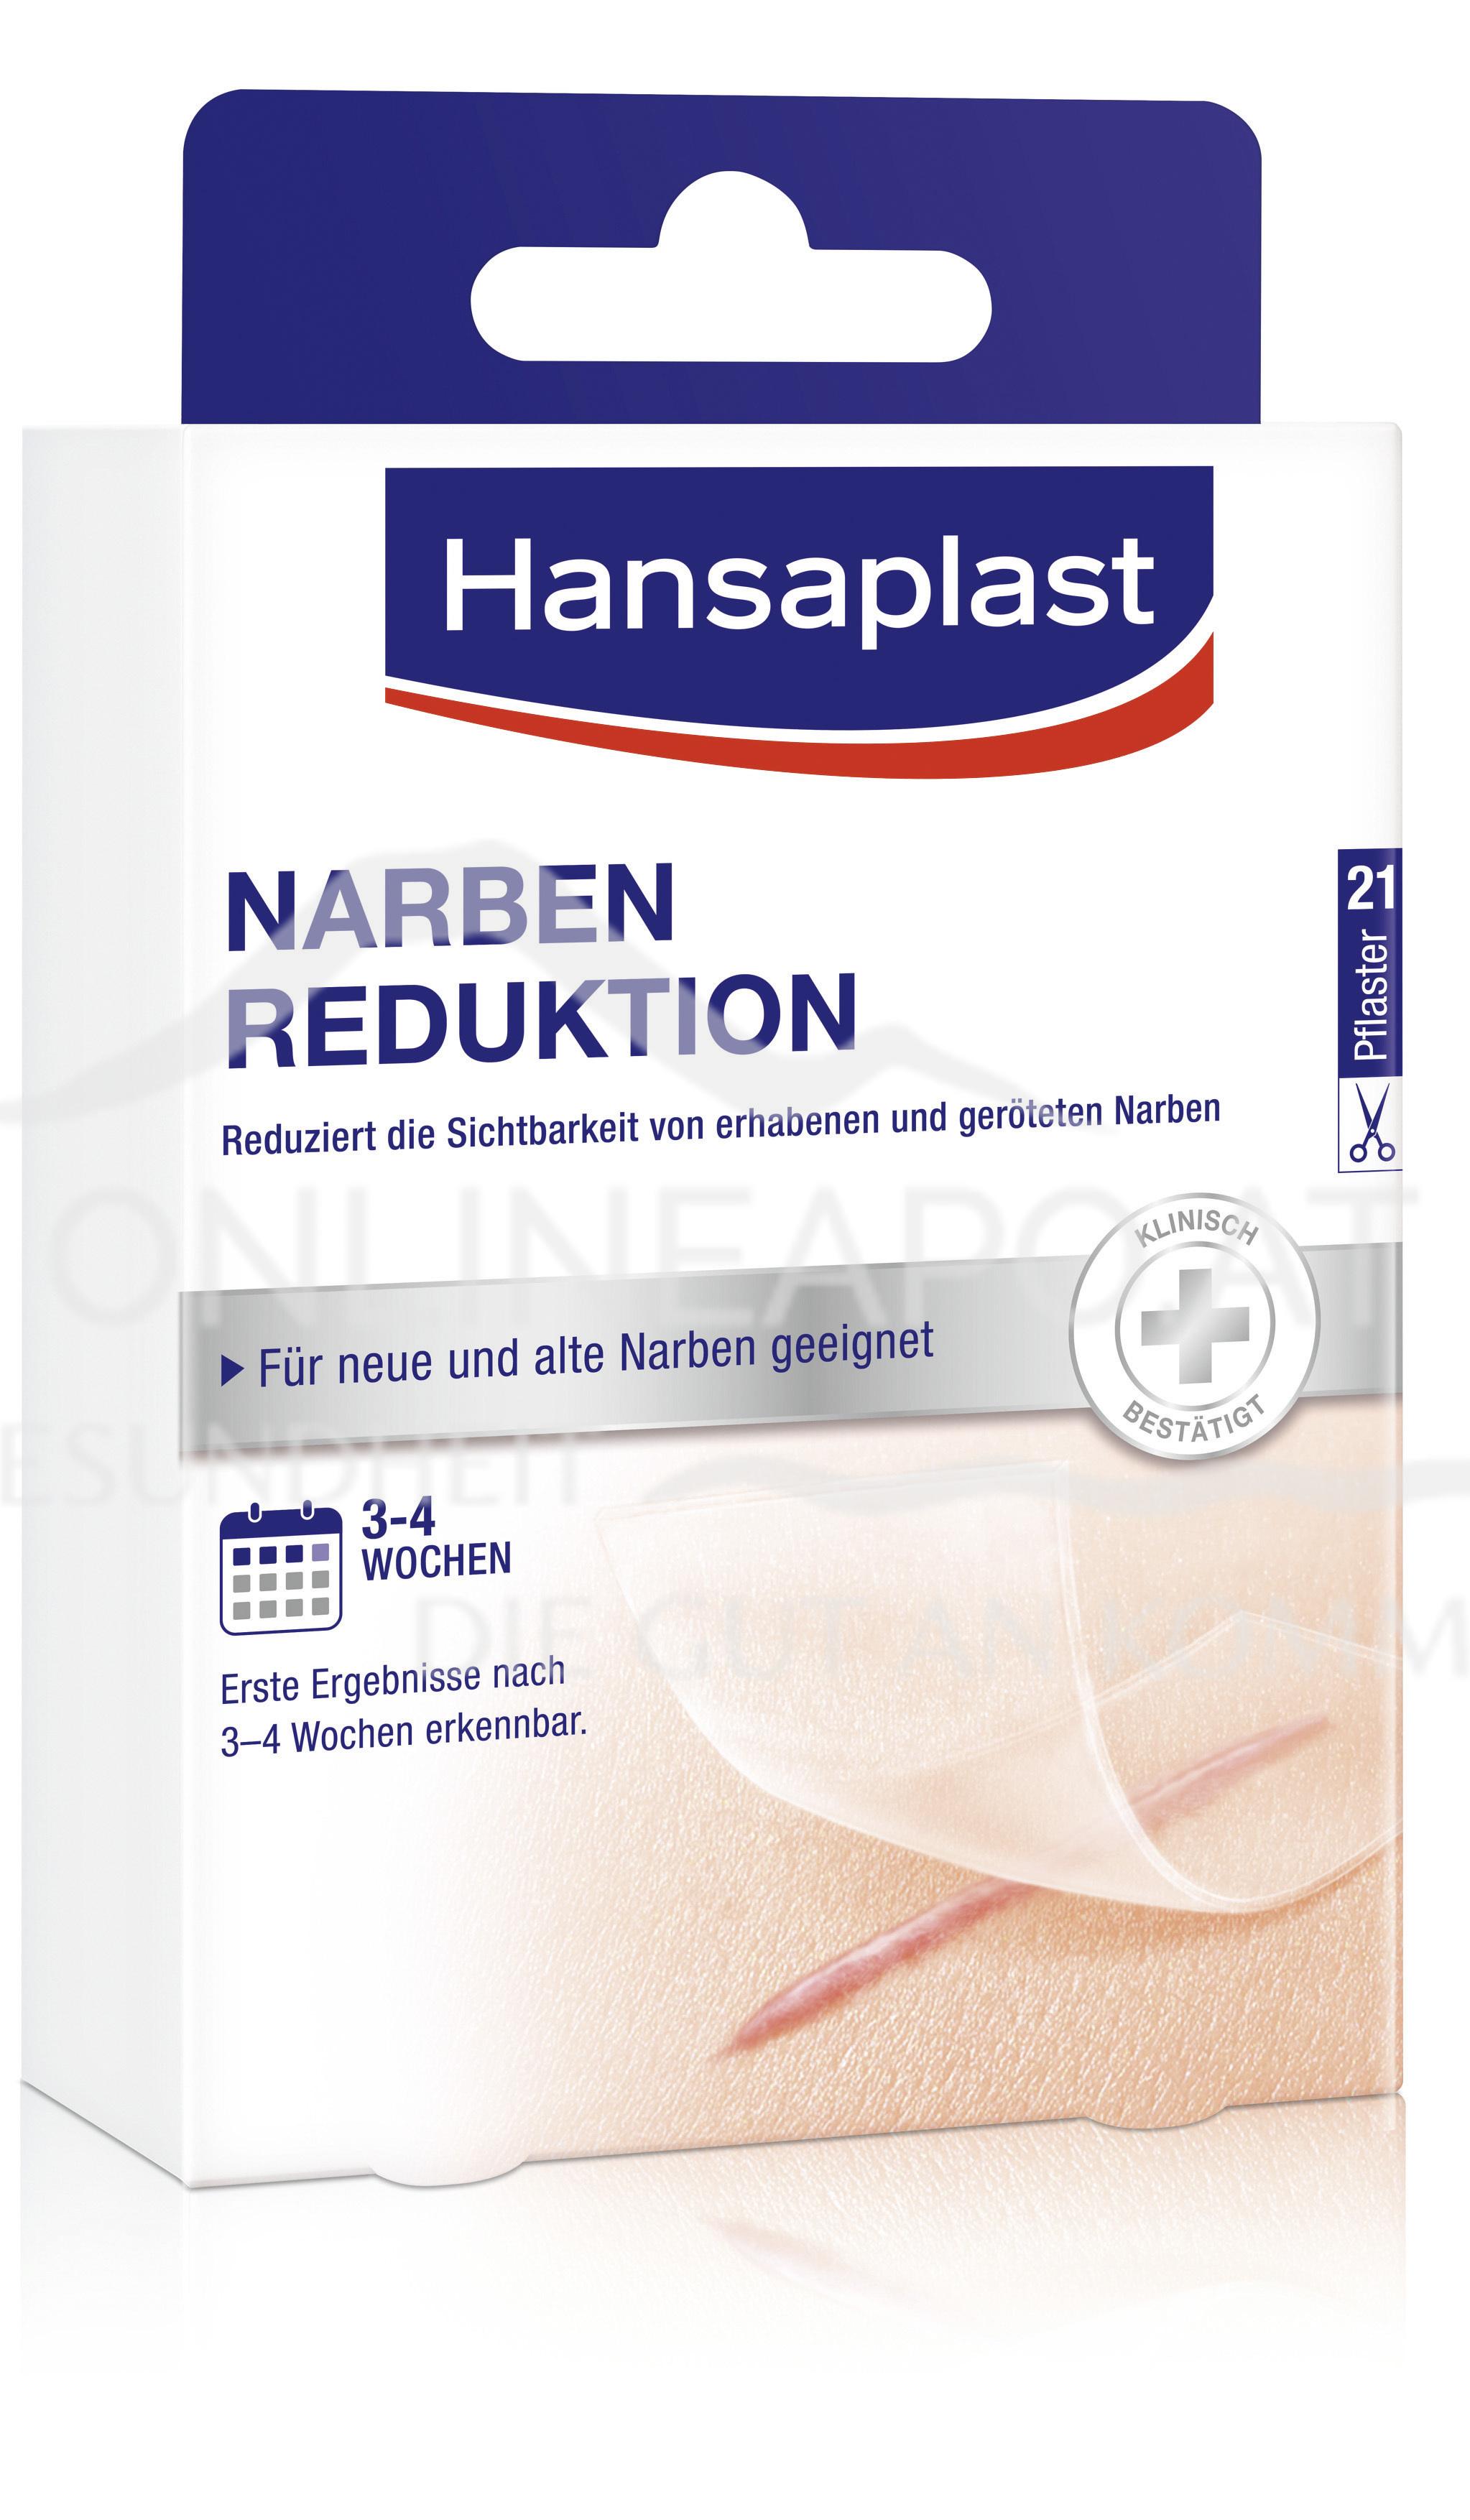 Hansaplast Narben Reduktion